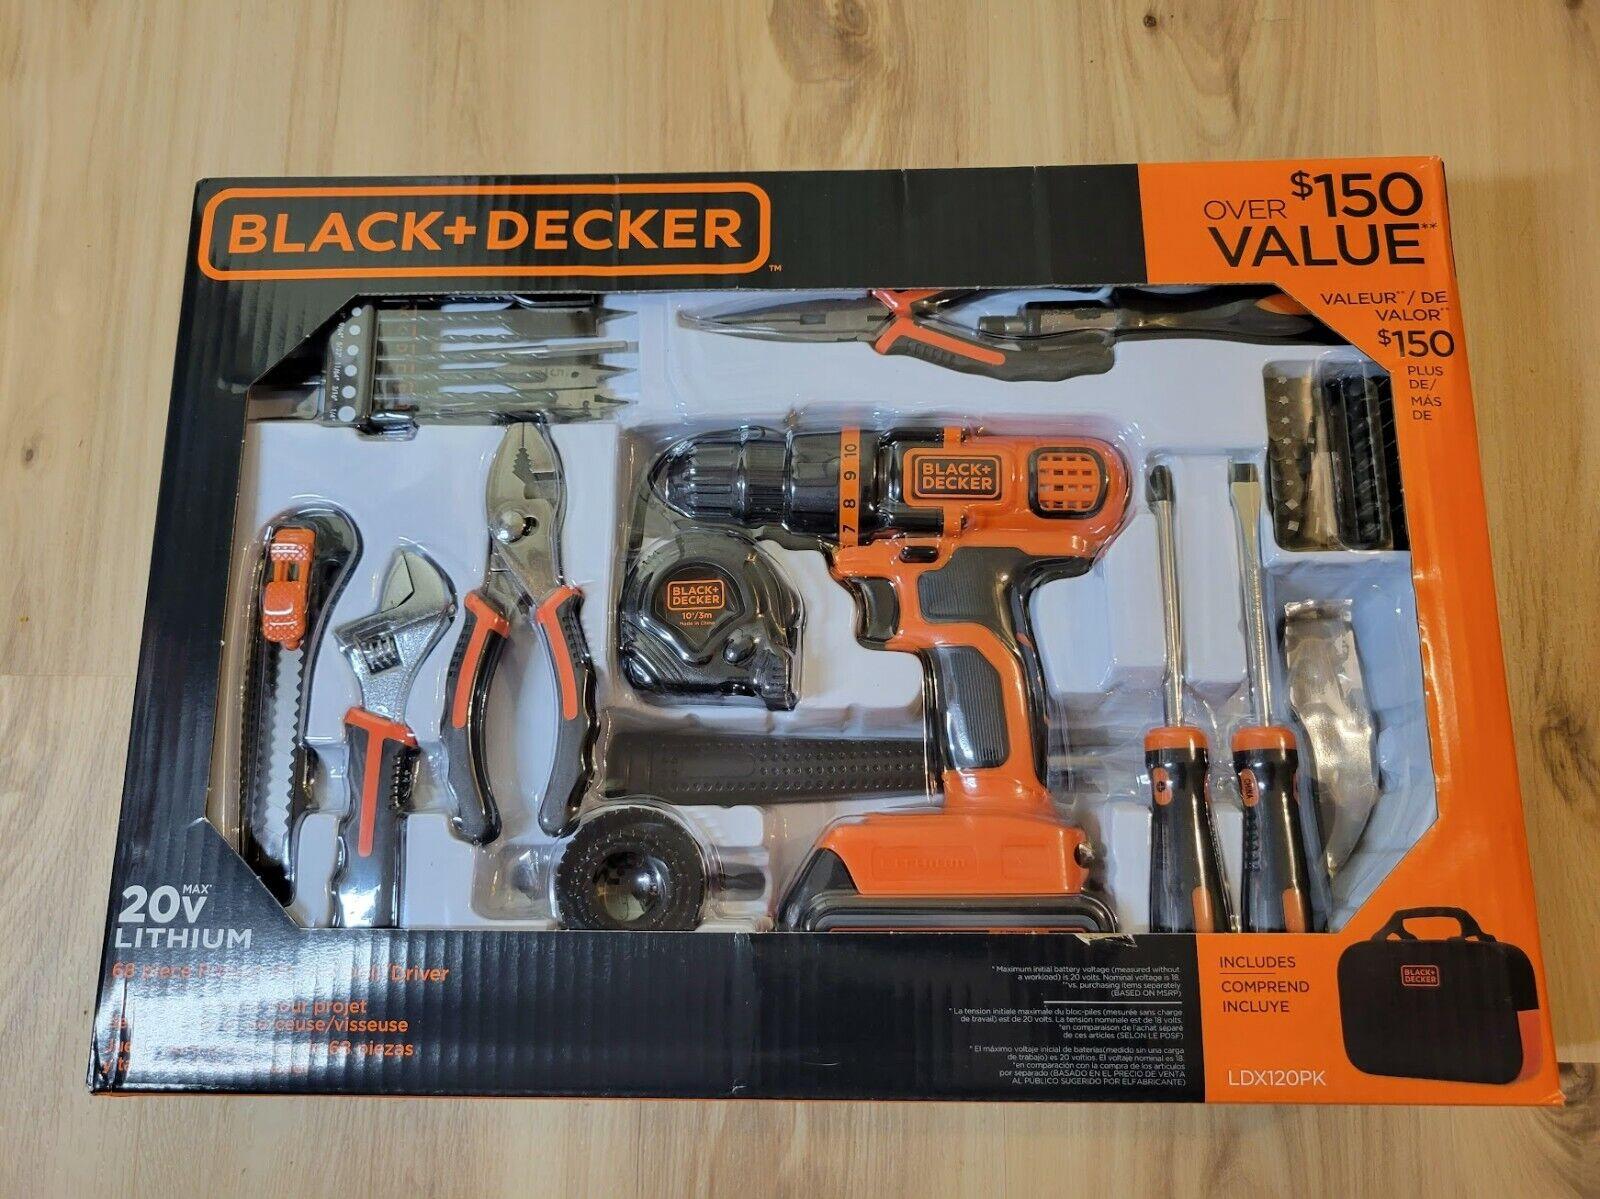 LDX120PK macadamistore Black & Decker 20V MAX Drill & 68 Piece Home Tool Kit - LDX120PK - FREE SHIPPING